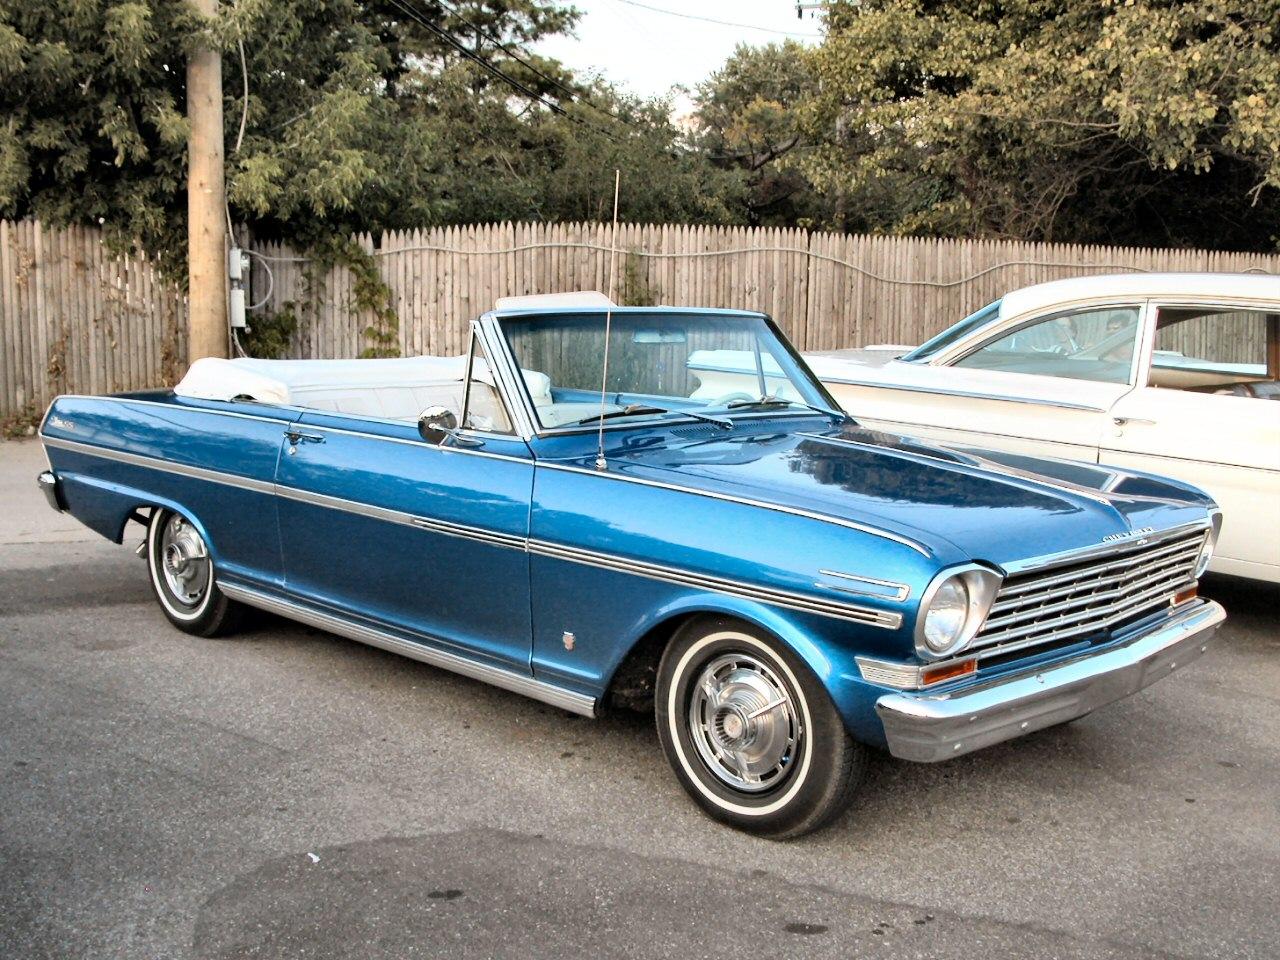 1963 Chevrolet Chevy II Nova SS Convertible Blue Fvr 2004 Dream Cruise N